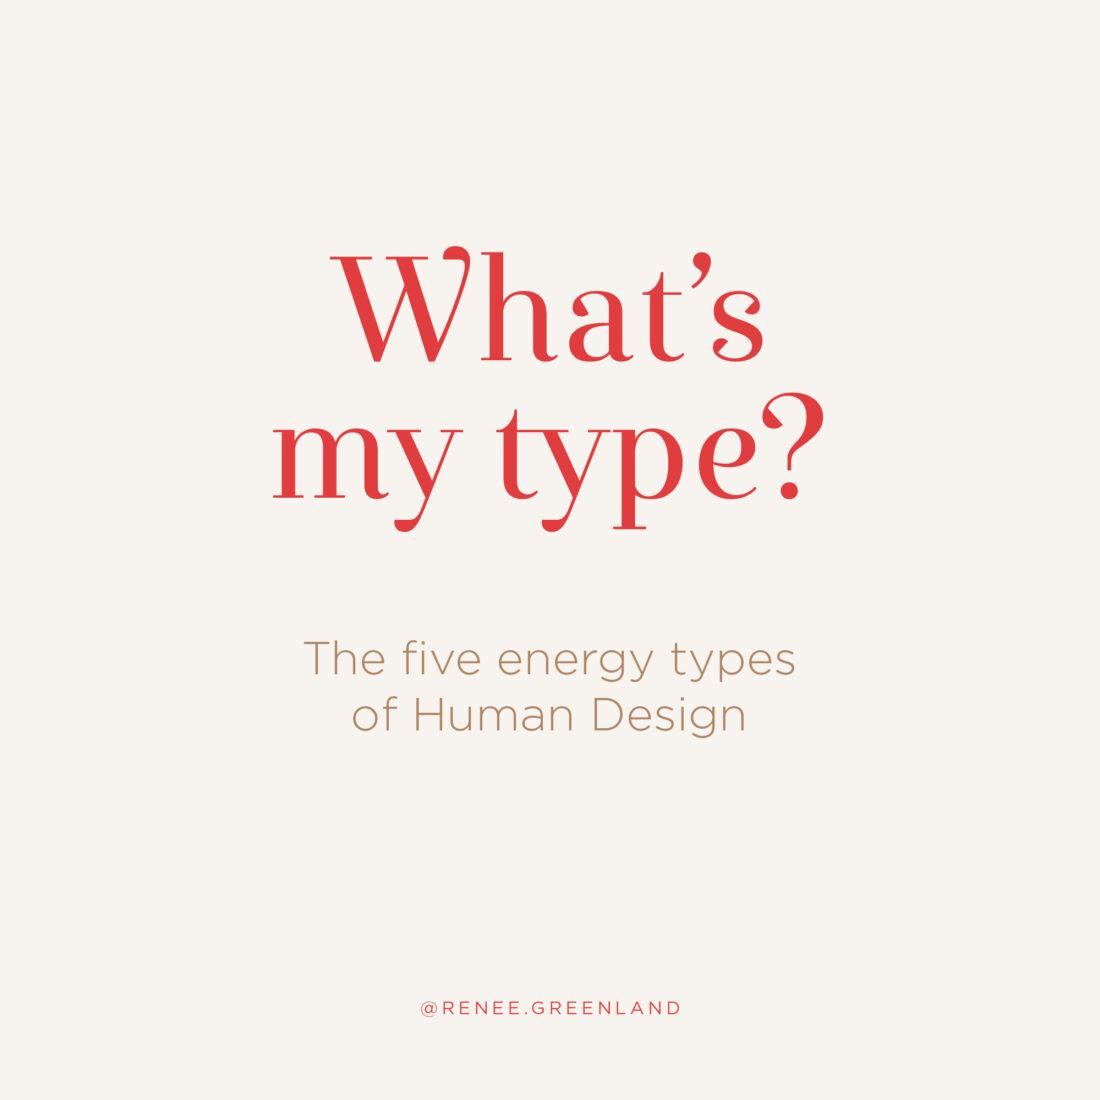 what's my human design energy type